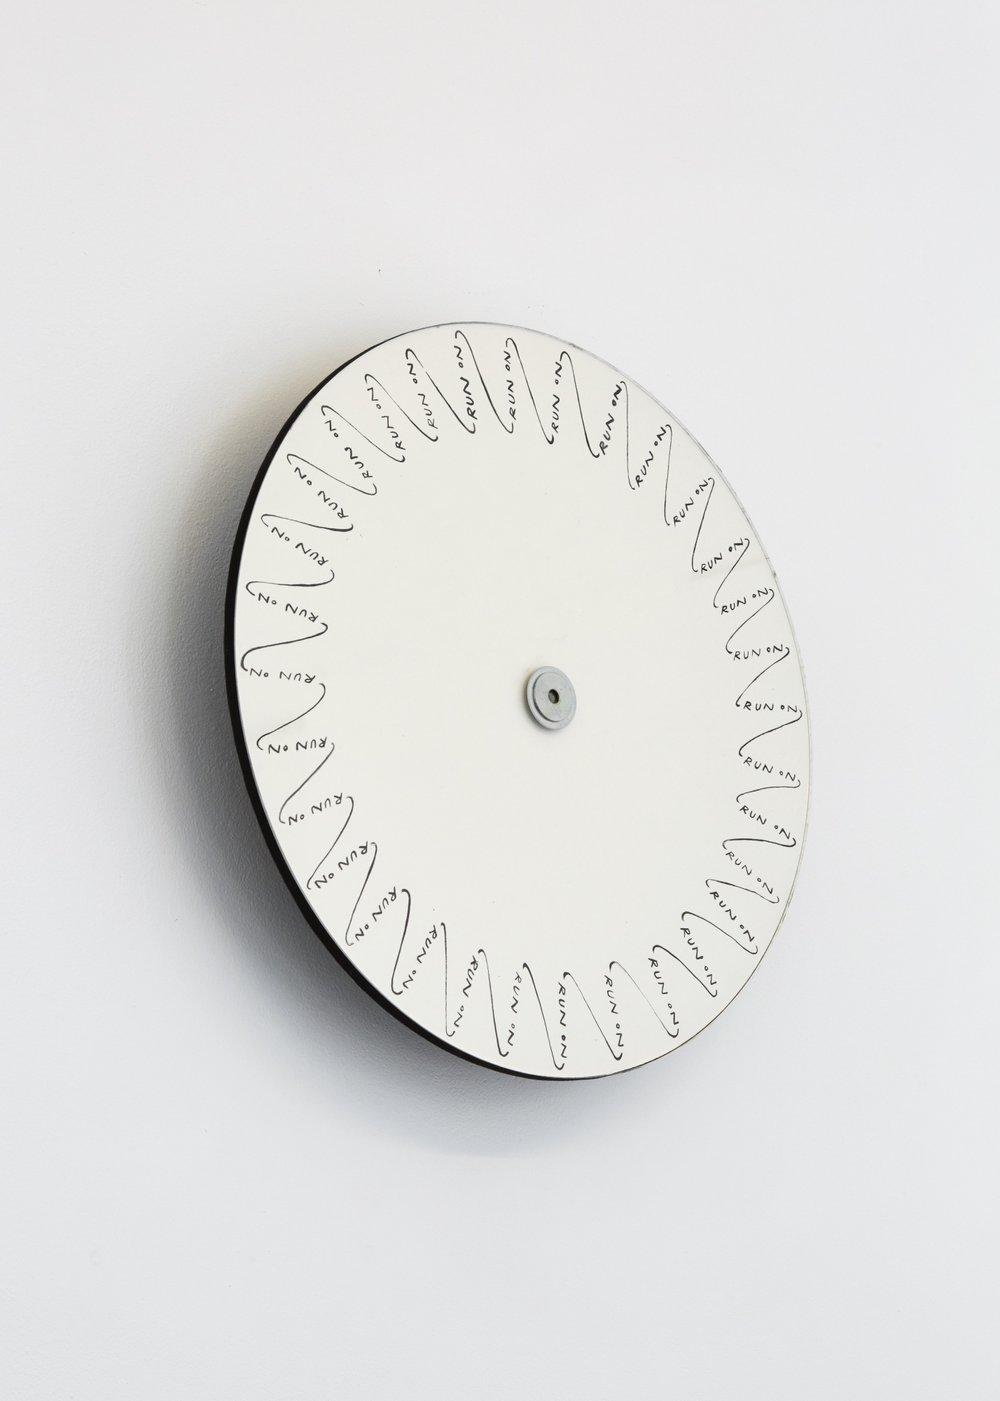 CGT_The Clock at the Sailors Arms_2_Fotor.jpg